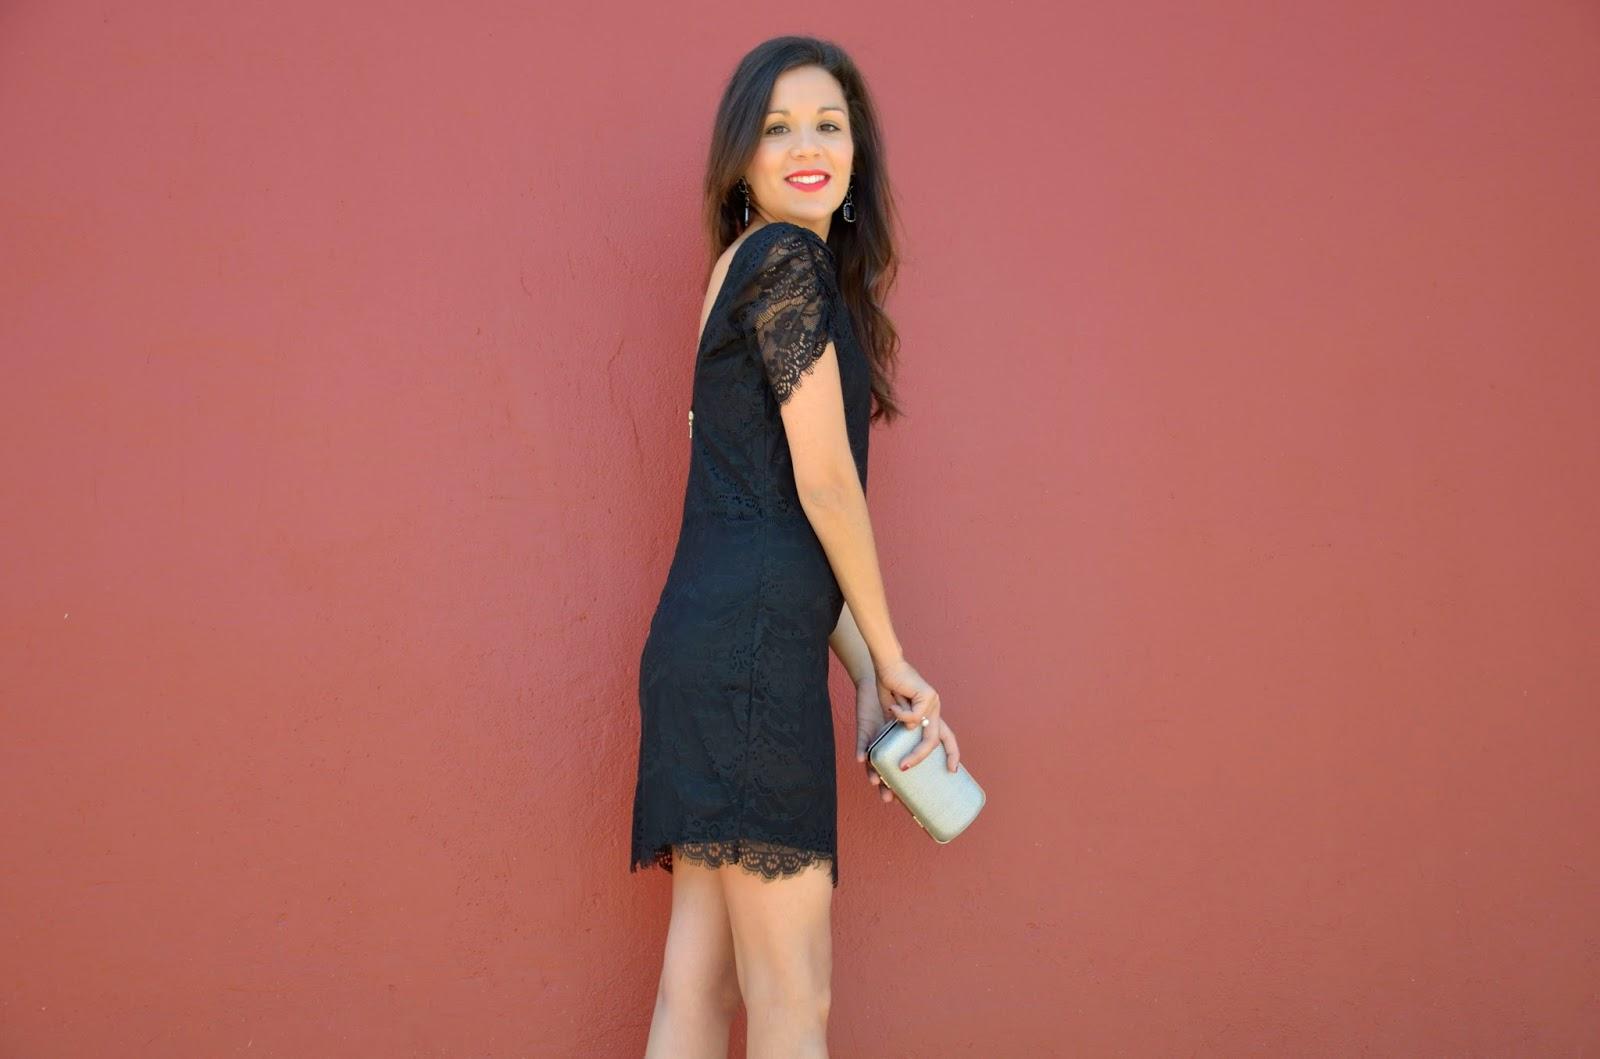 vestido-negro-look-elegante-sexy-black-dress-blogger f64ce48f842